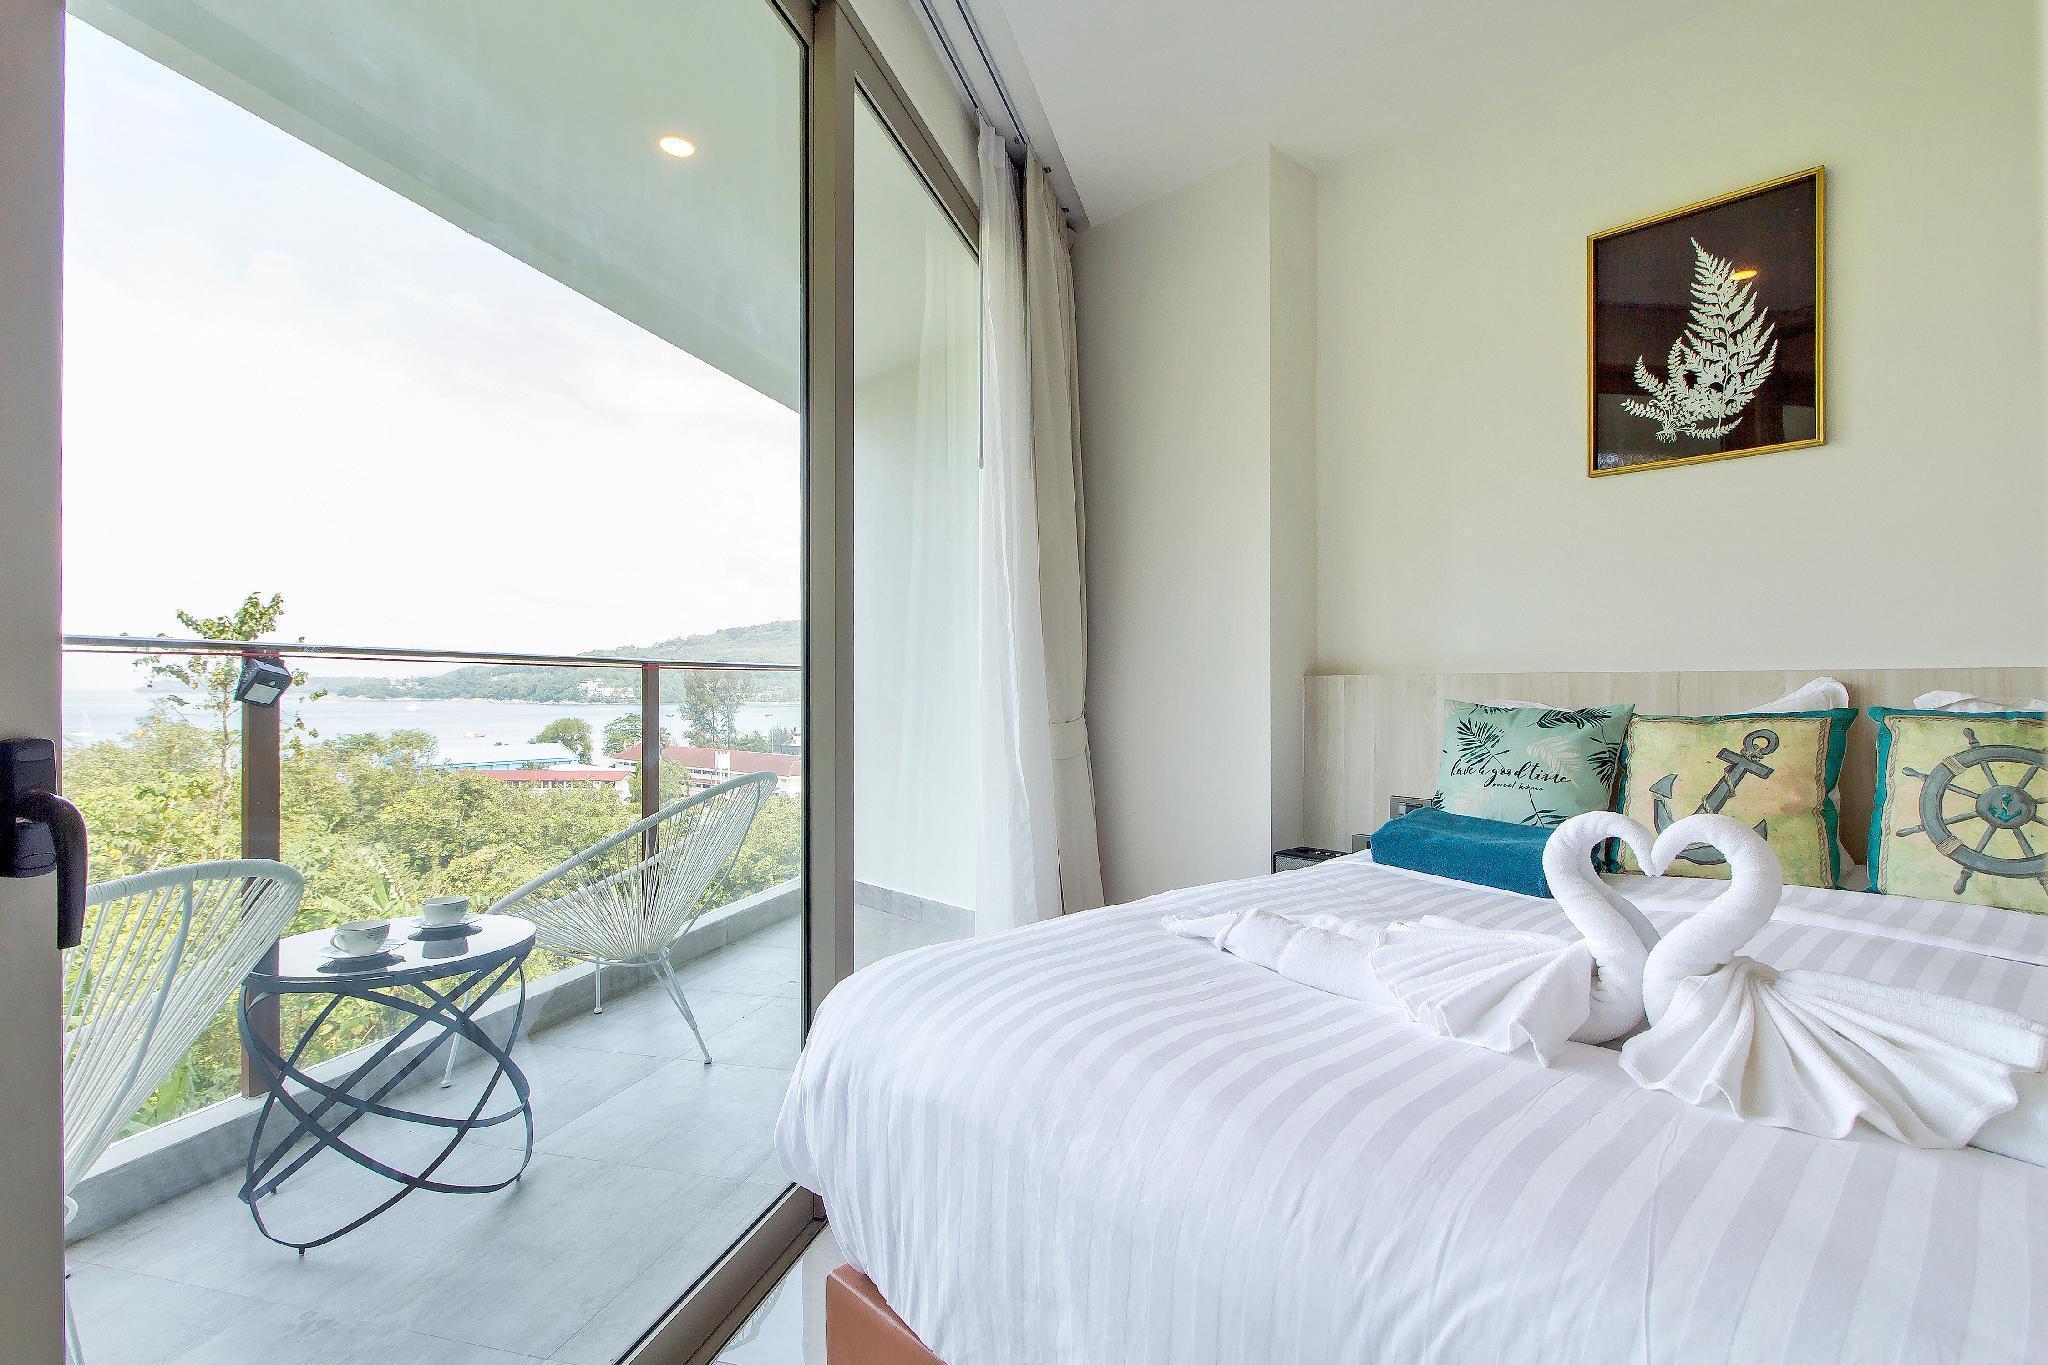 oceana seaview apartment(300meters to sea beach) อพาร์ตเมนต์ 1 ห้องนอน 1 ห้องน้ำส่วนตัว ขนาด 43 ตร.ม. – กมลา